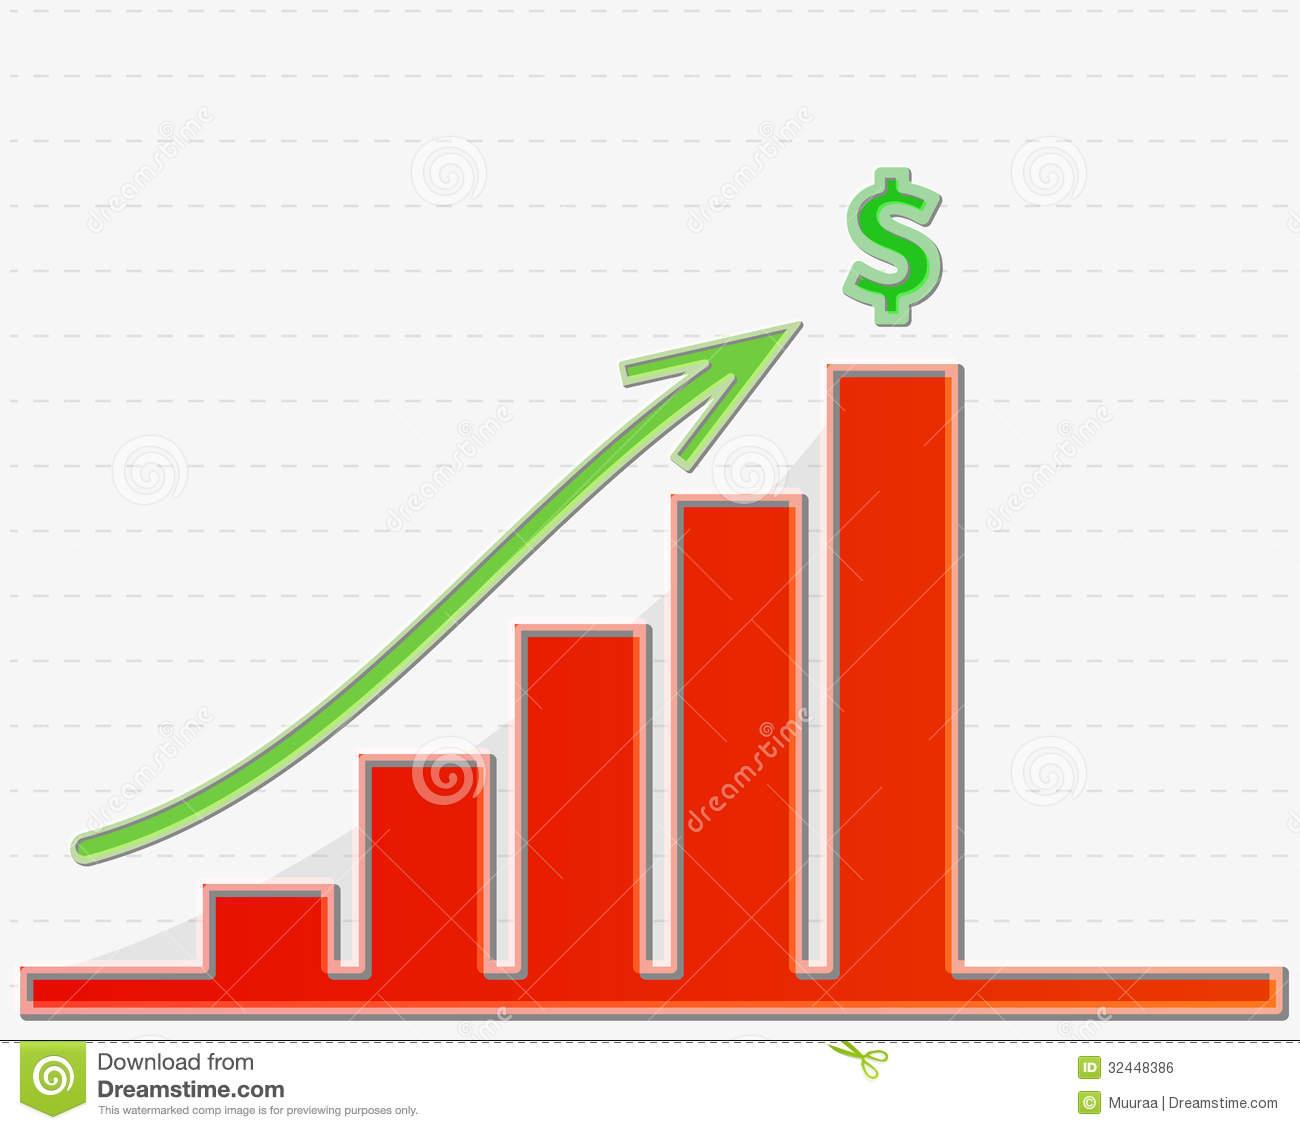 Arrow clipart money Art Clipart red%20money%20sign%20clip%20art Free Clip